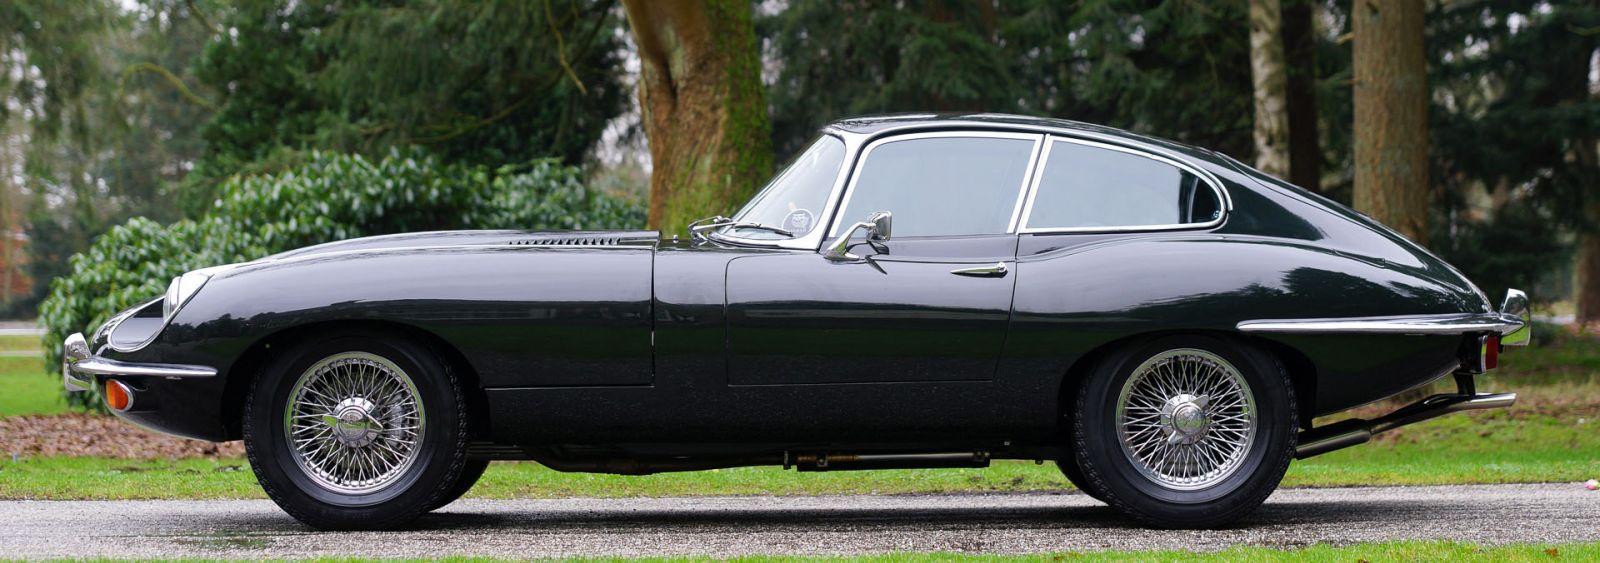 Jaguar Etype 42 Litre FHC S2 1969  Welcome to ClassiCarGarage